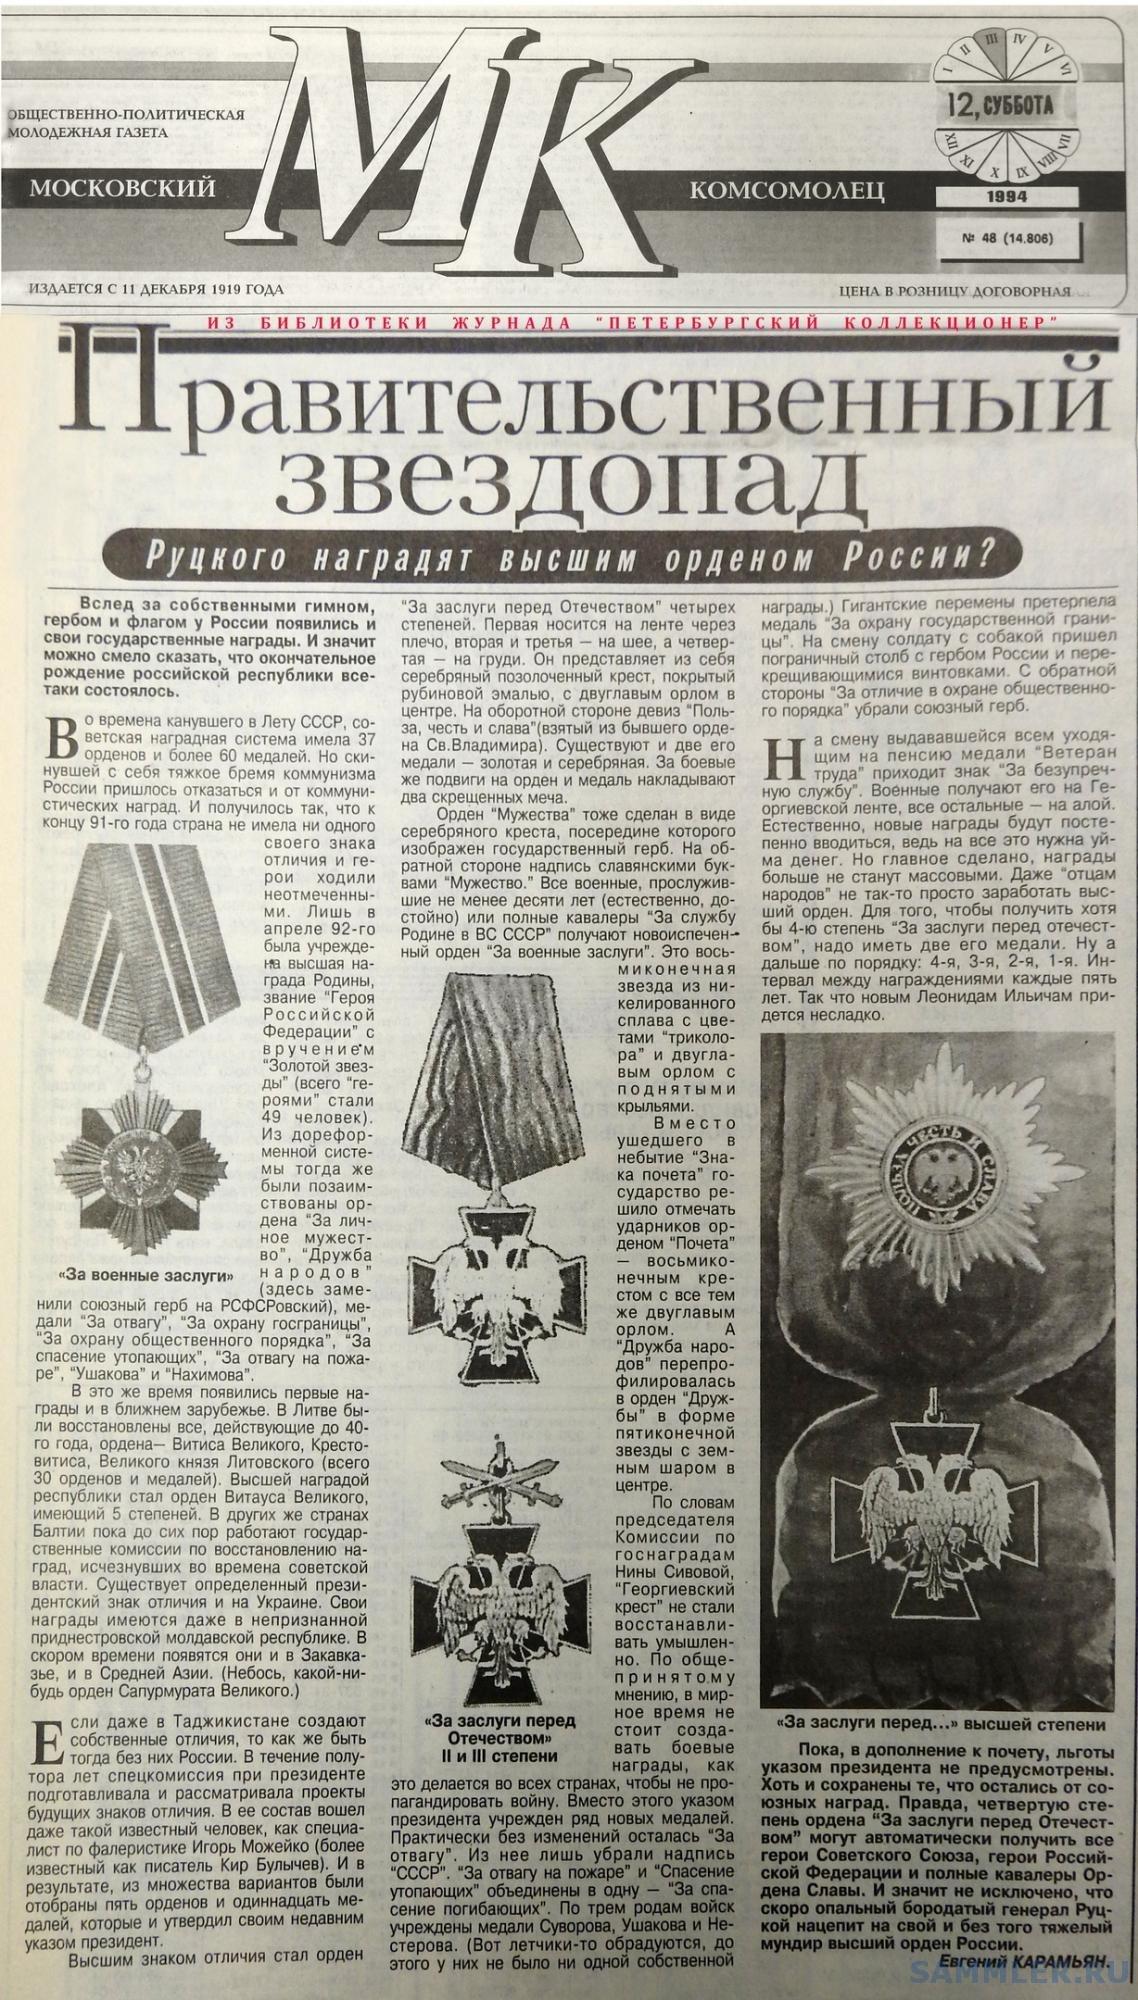 Правительственный звездопаад - Е. Карамьян, МК, 1994, 12 марта.jpg